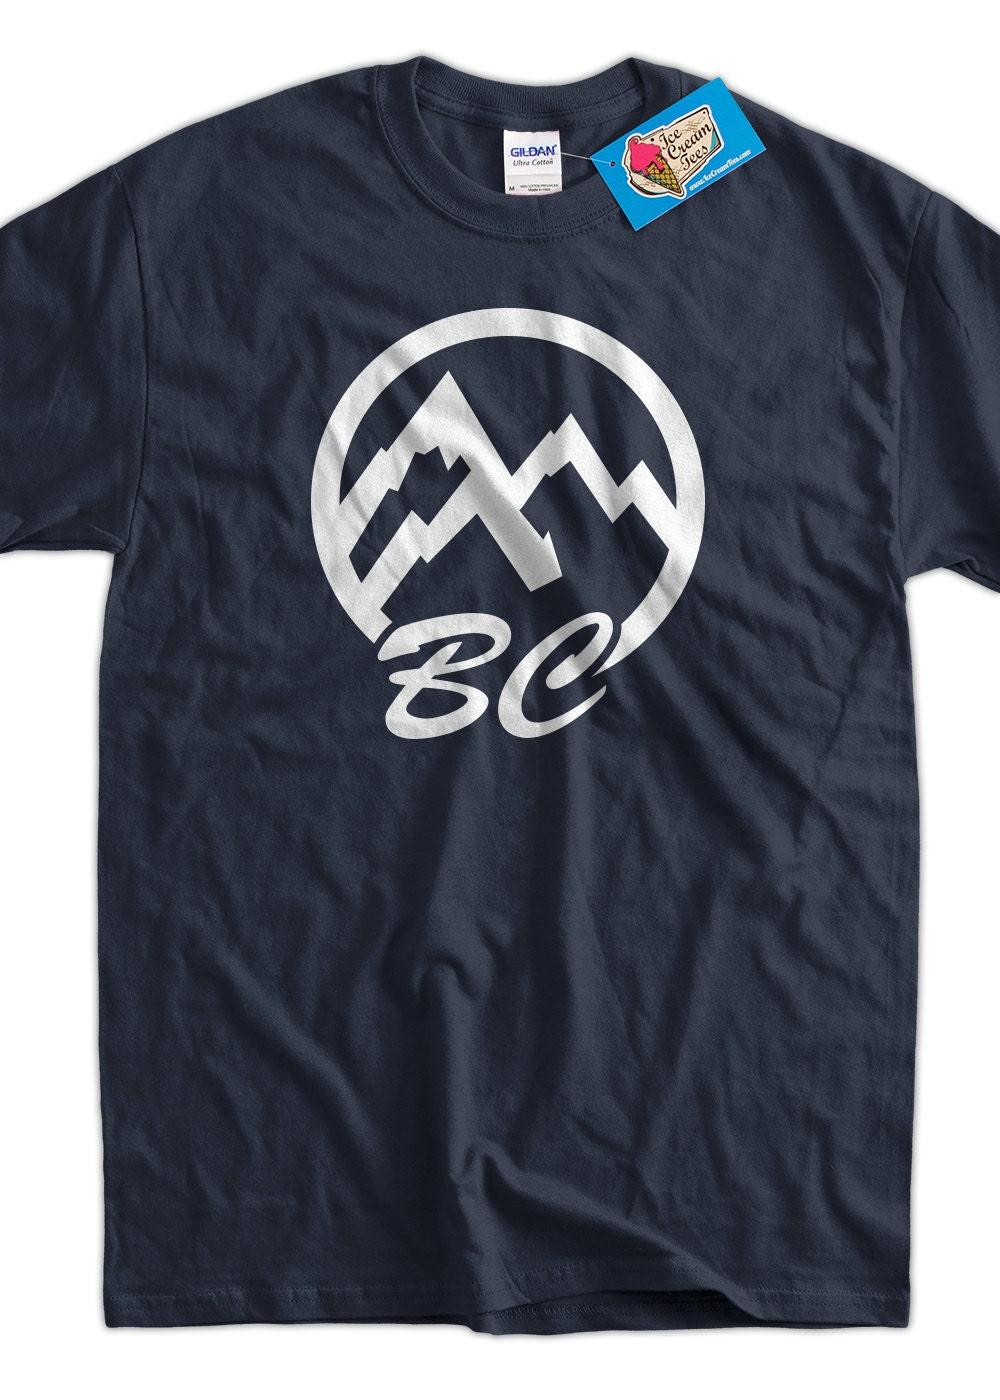 Bc british columbia canada t shirt screen printed tee shirt for Where can i get a shirt screen printed